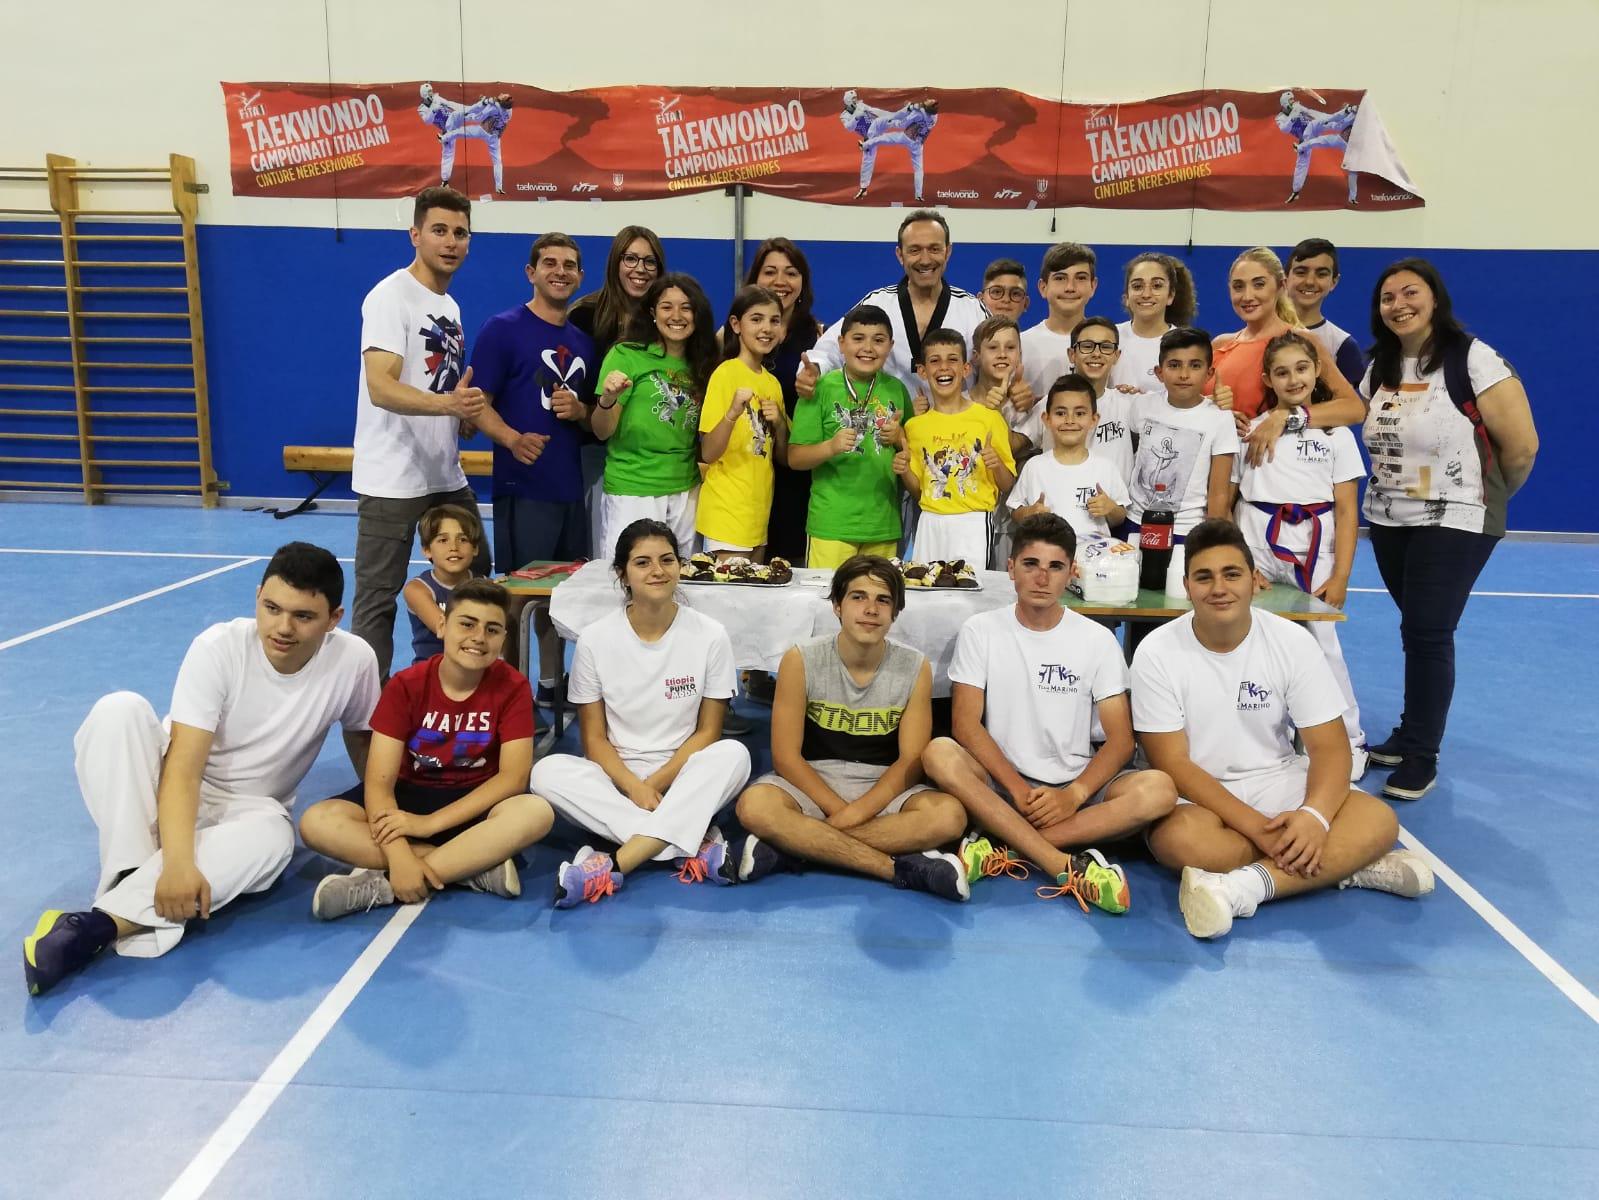 Roma: Taekwondo. 2 medaglie per l'A.S.D. Taekwondo Mazara